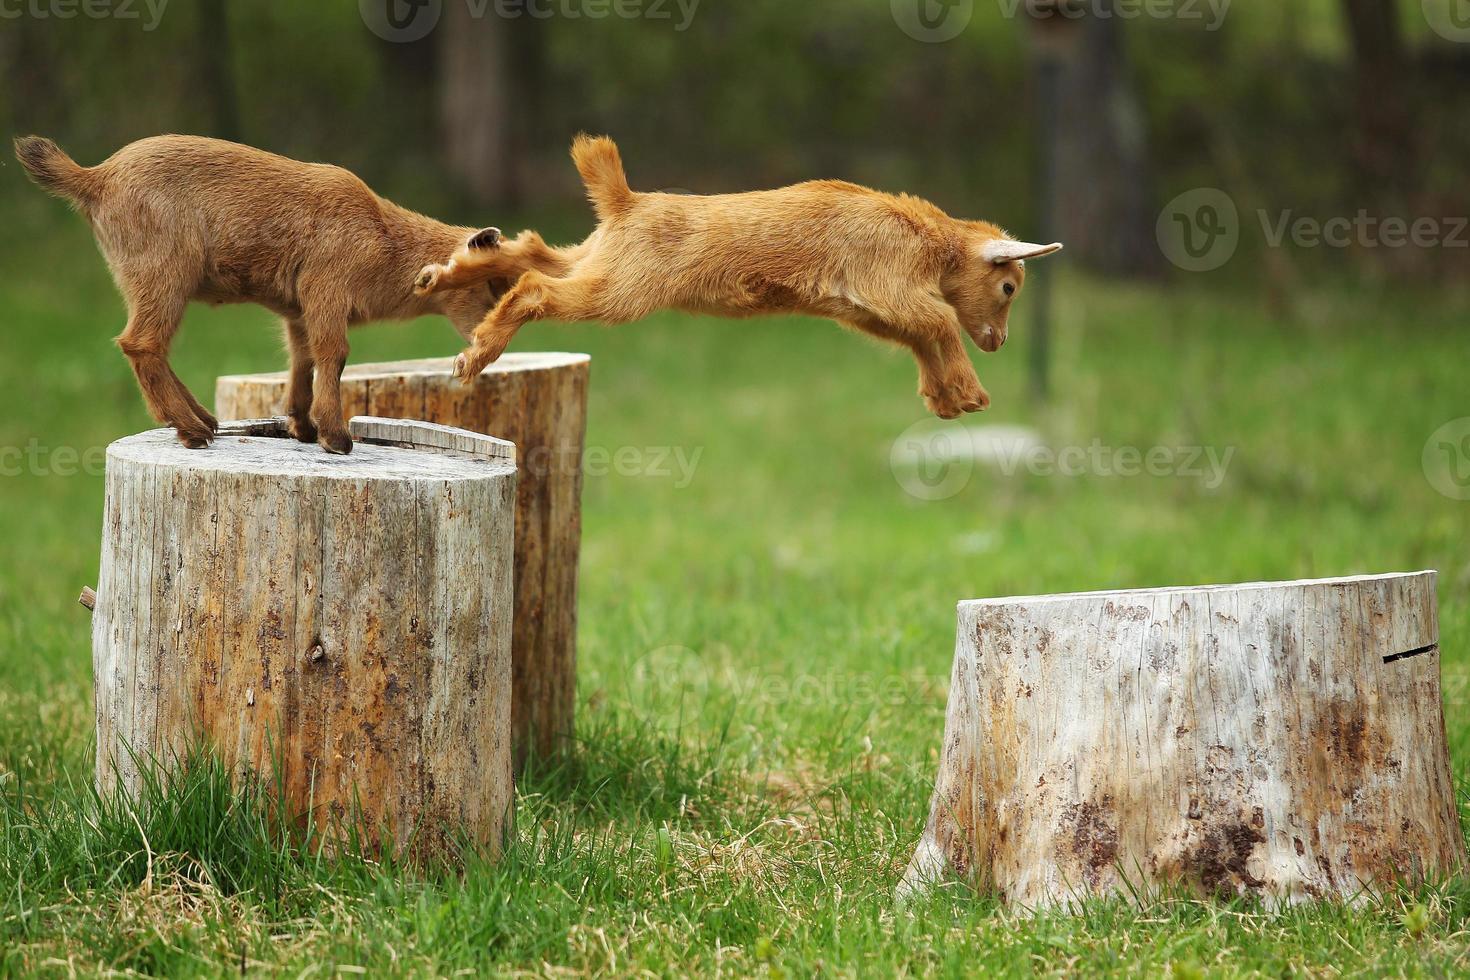 Jumping Goat photo